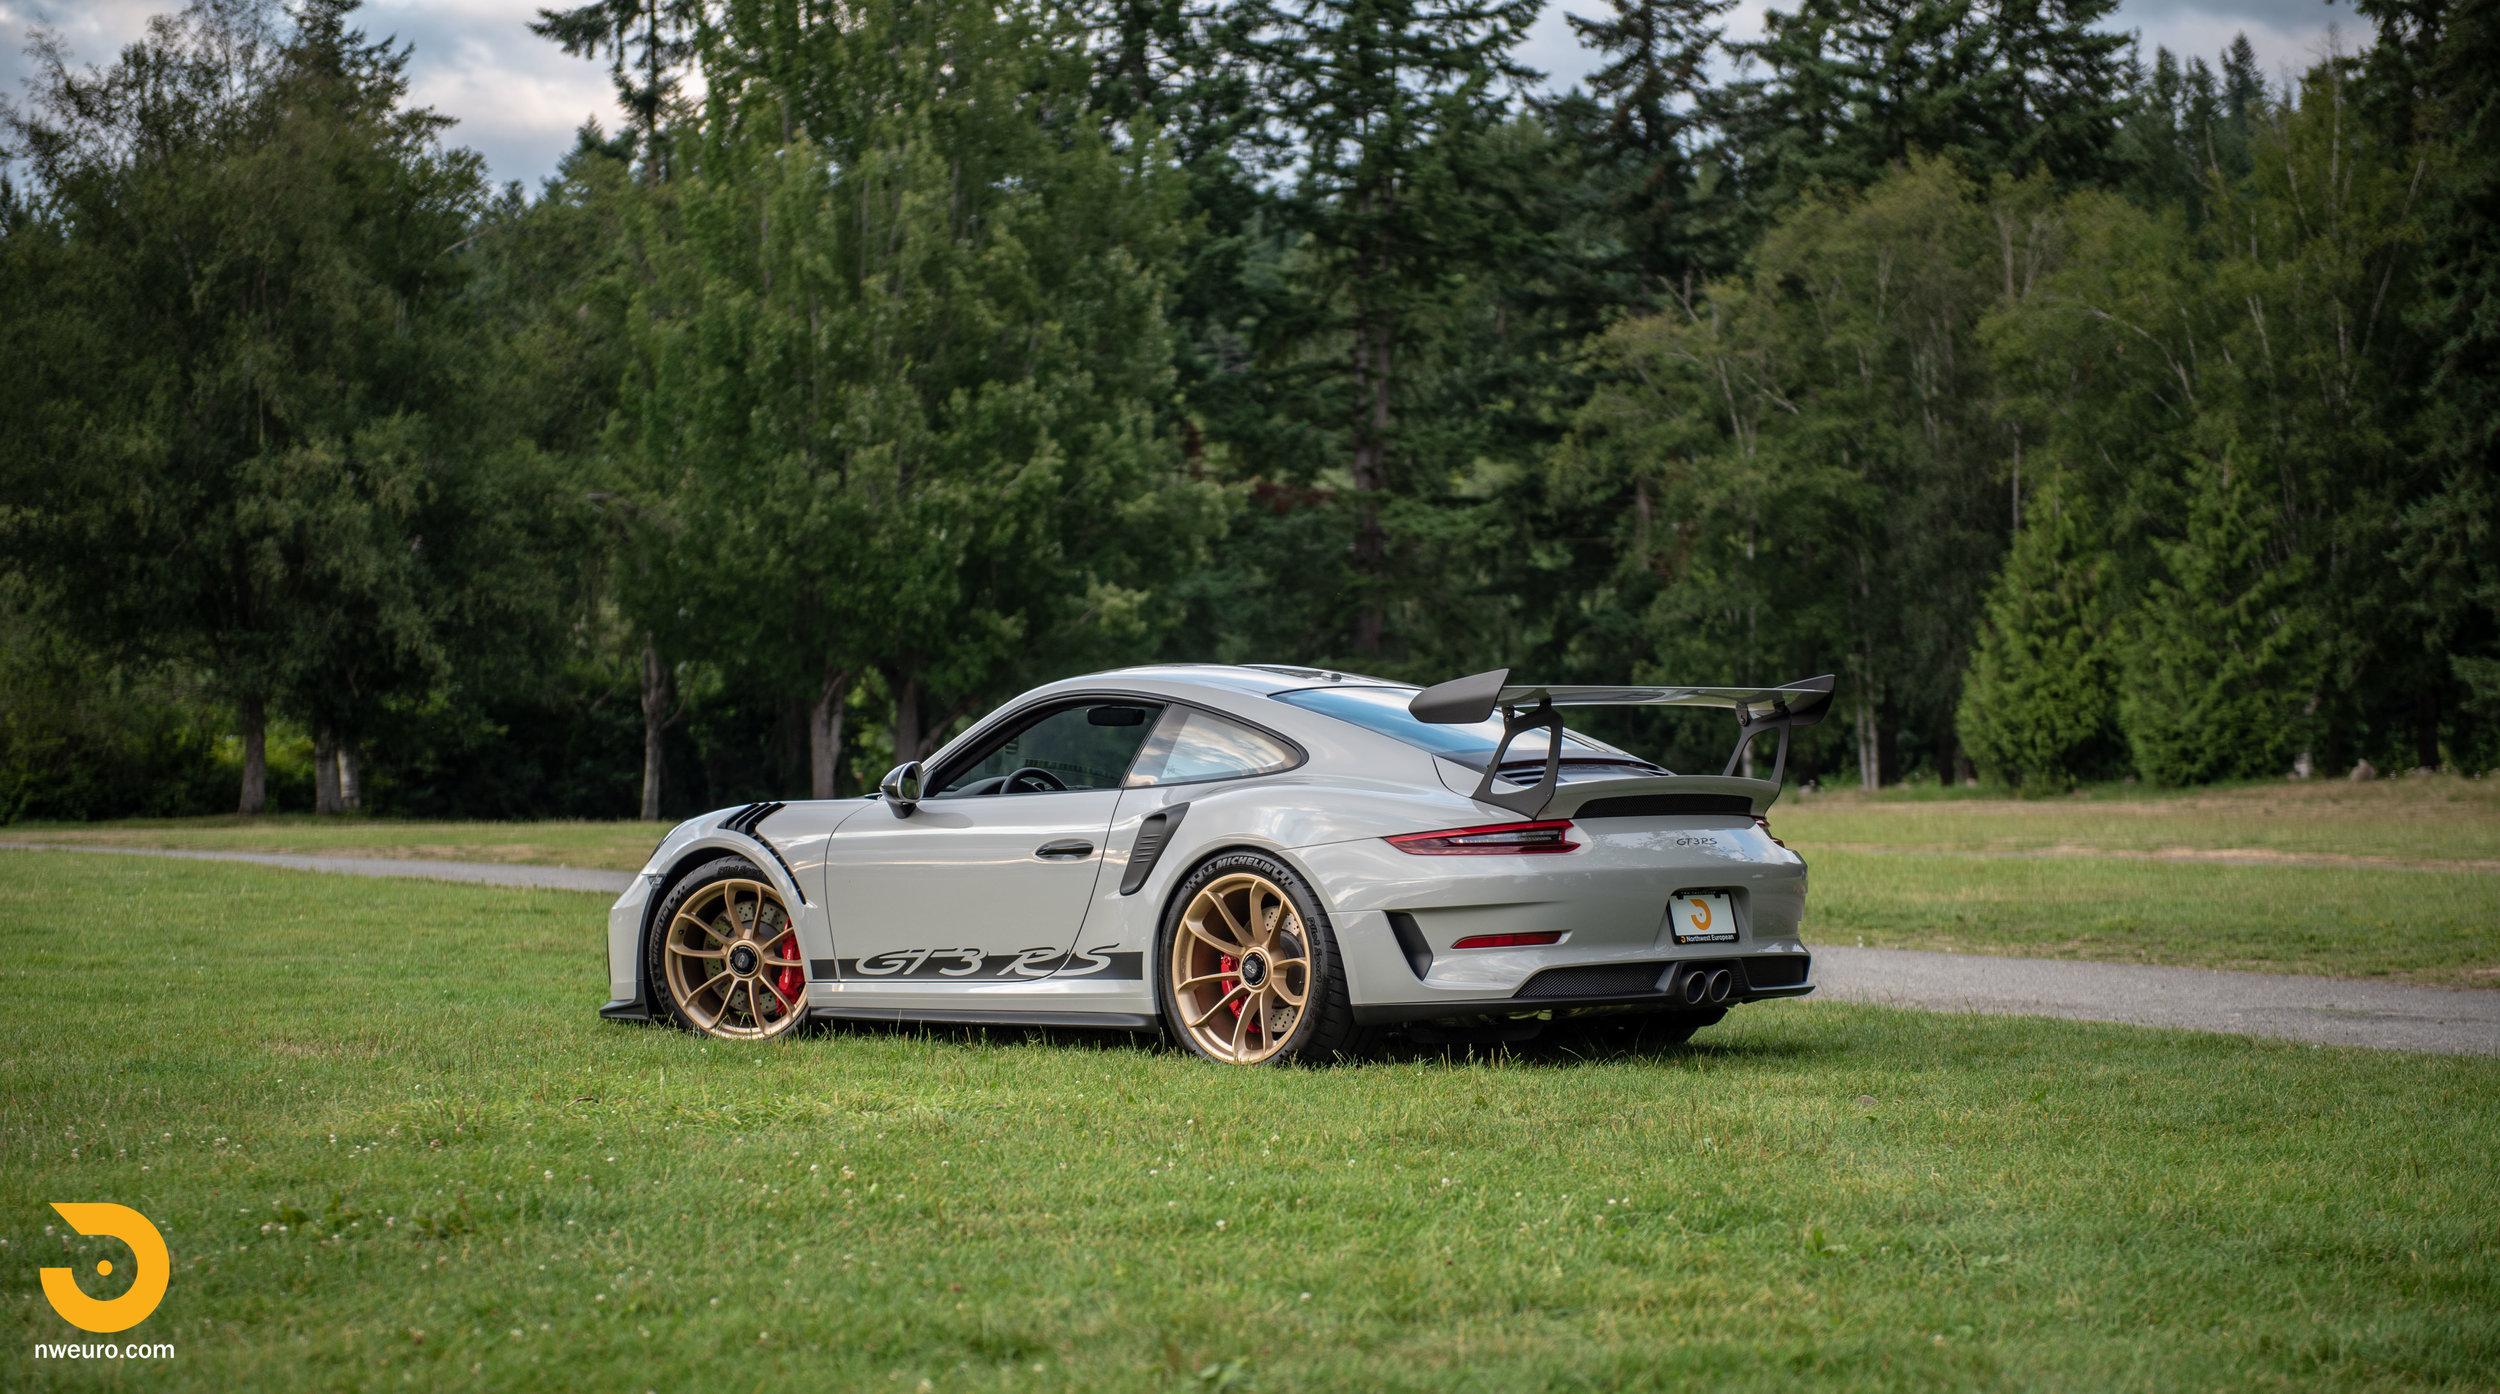 2019 Porsche GT3 RS - Chalk-83.jpg